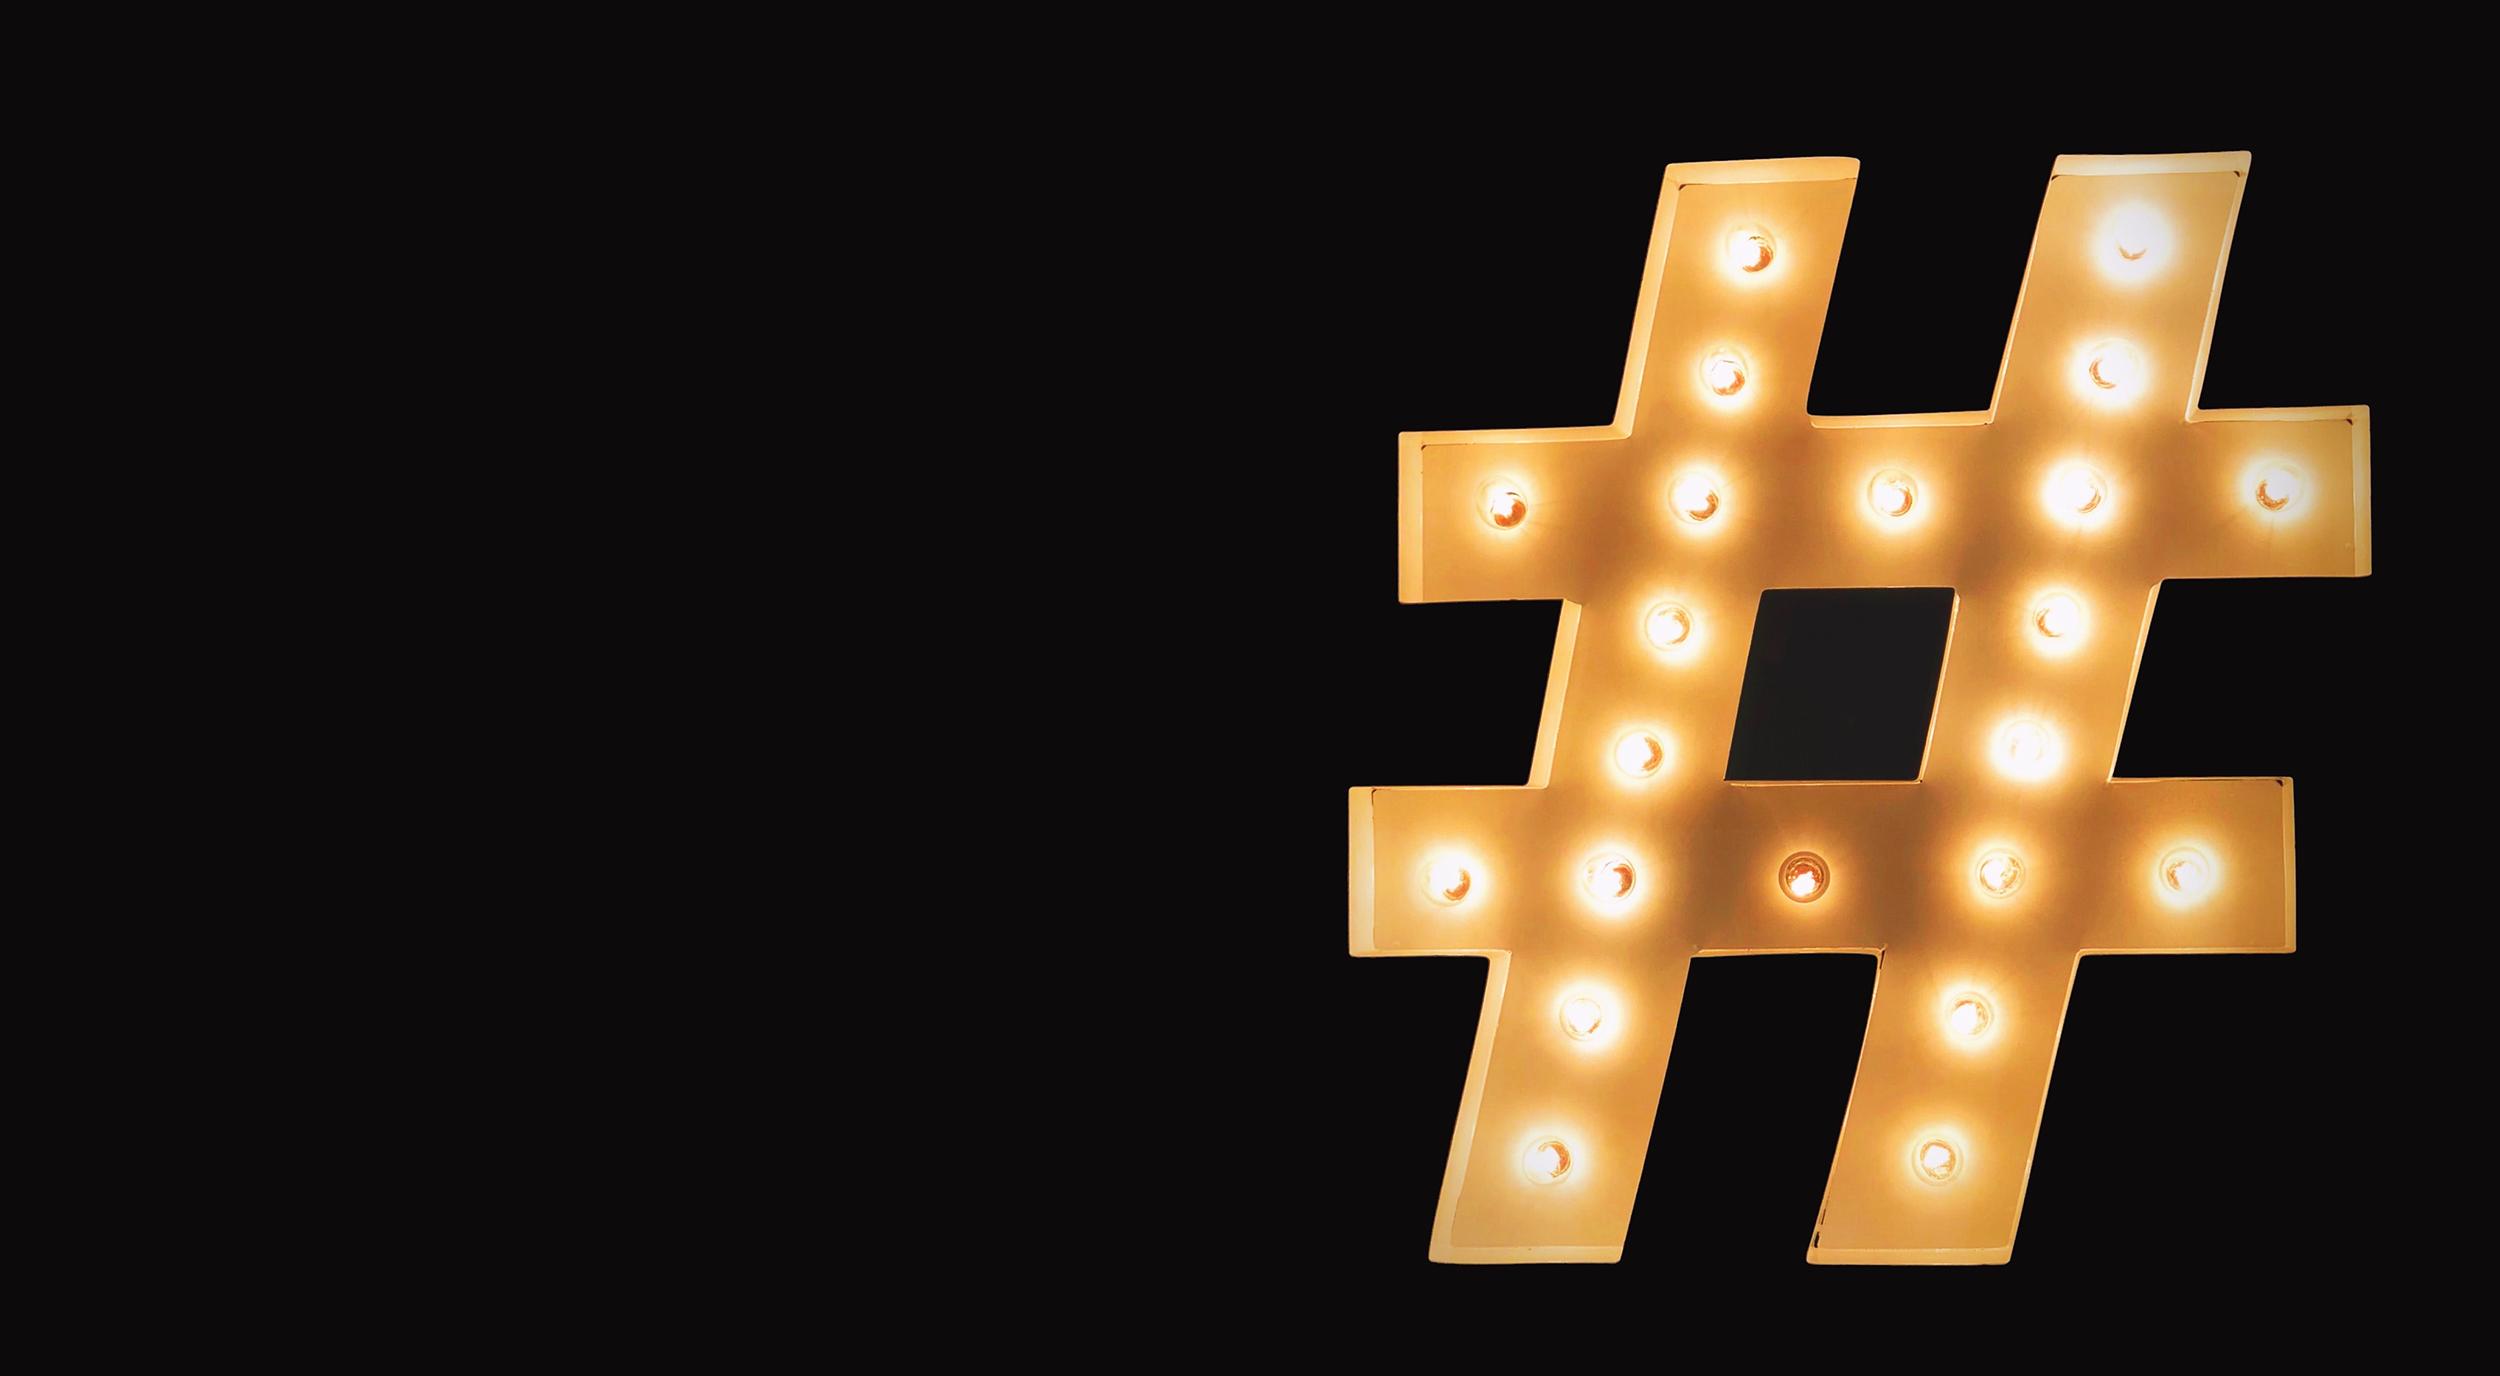 hashtag jel